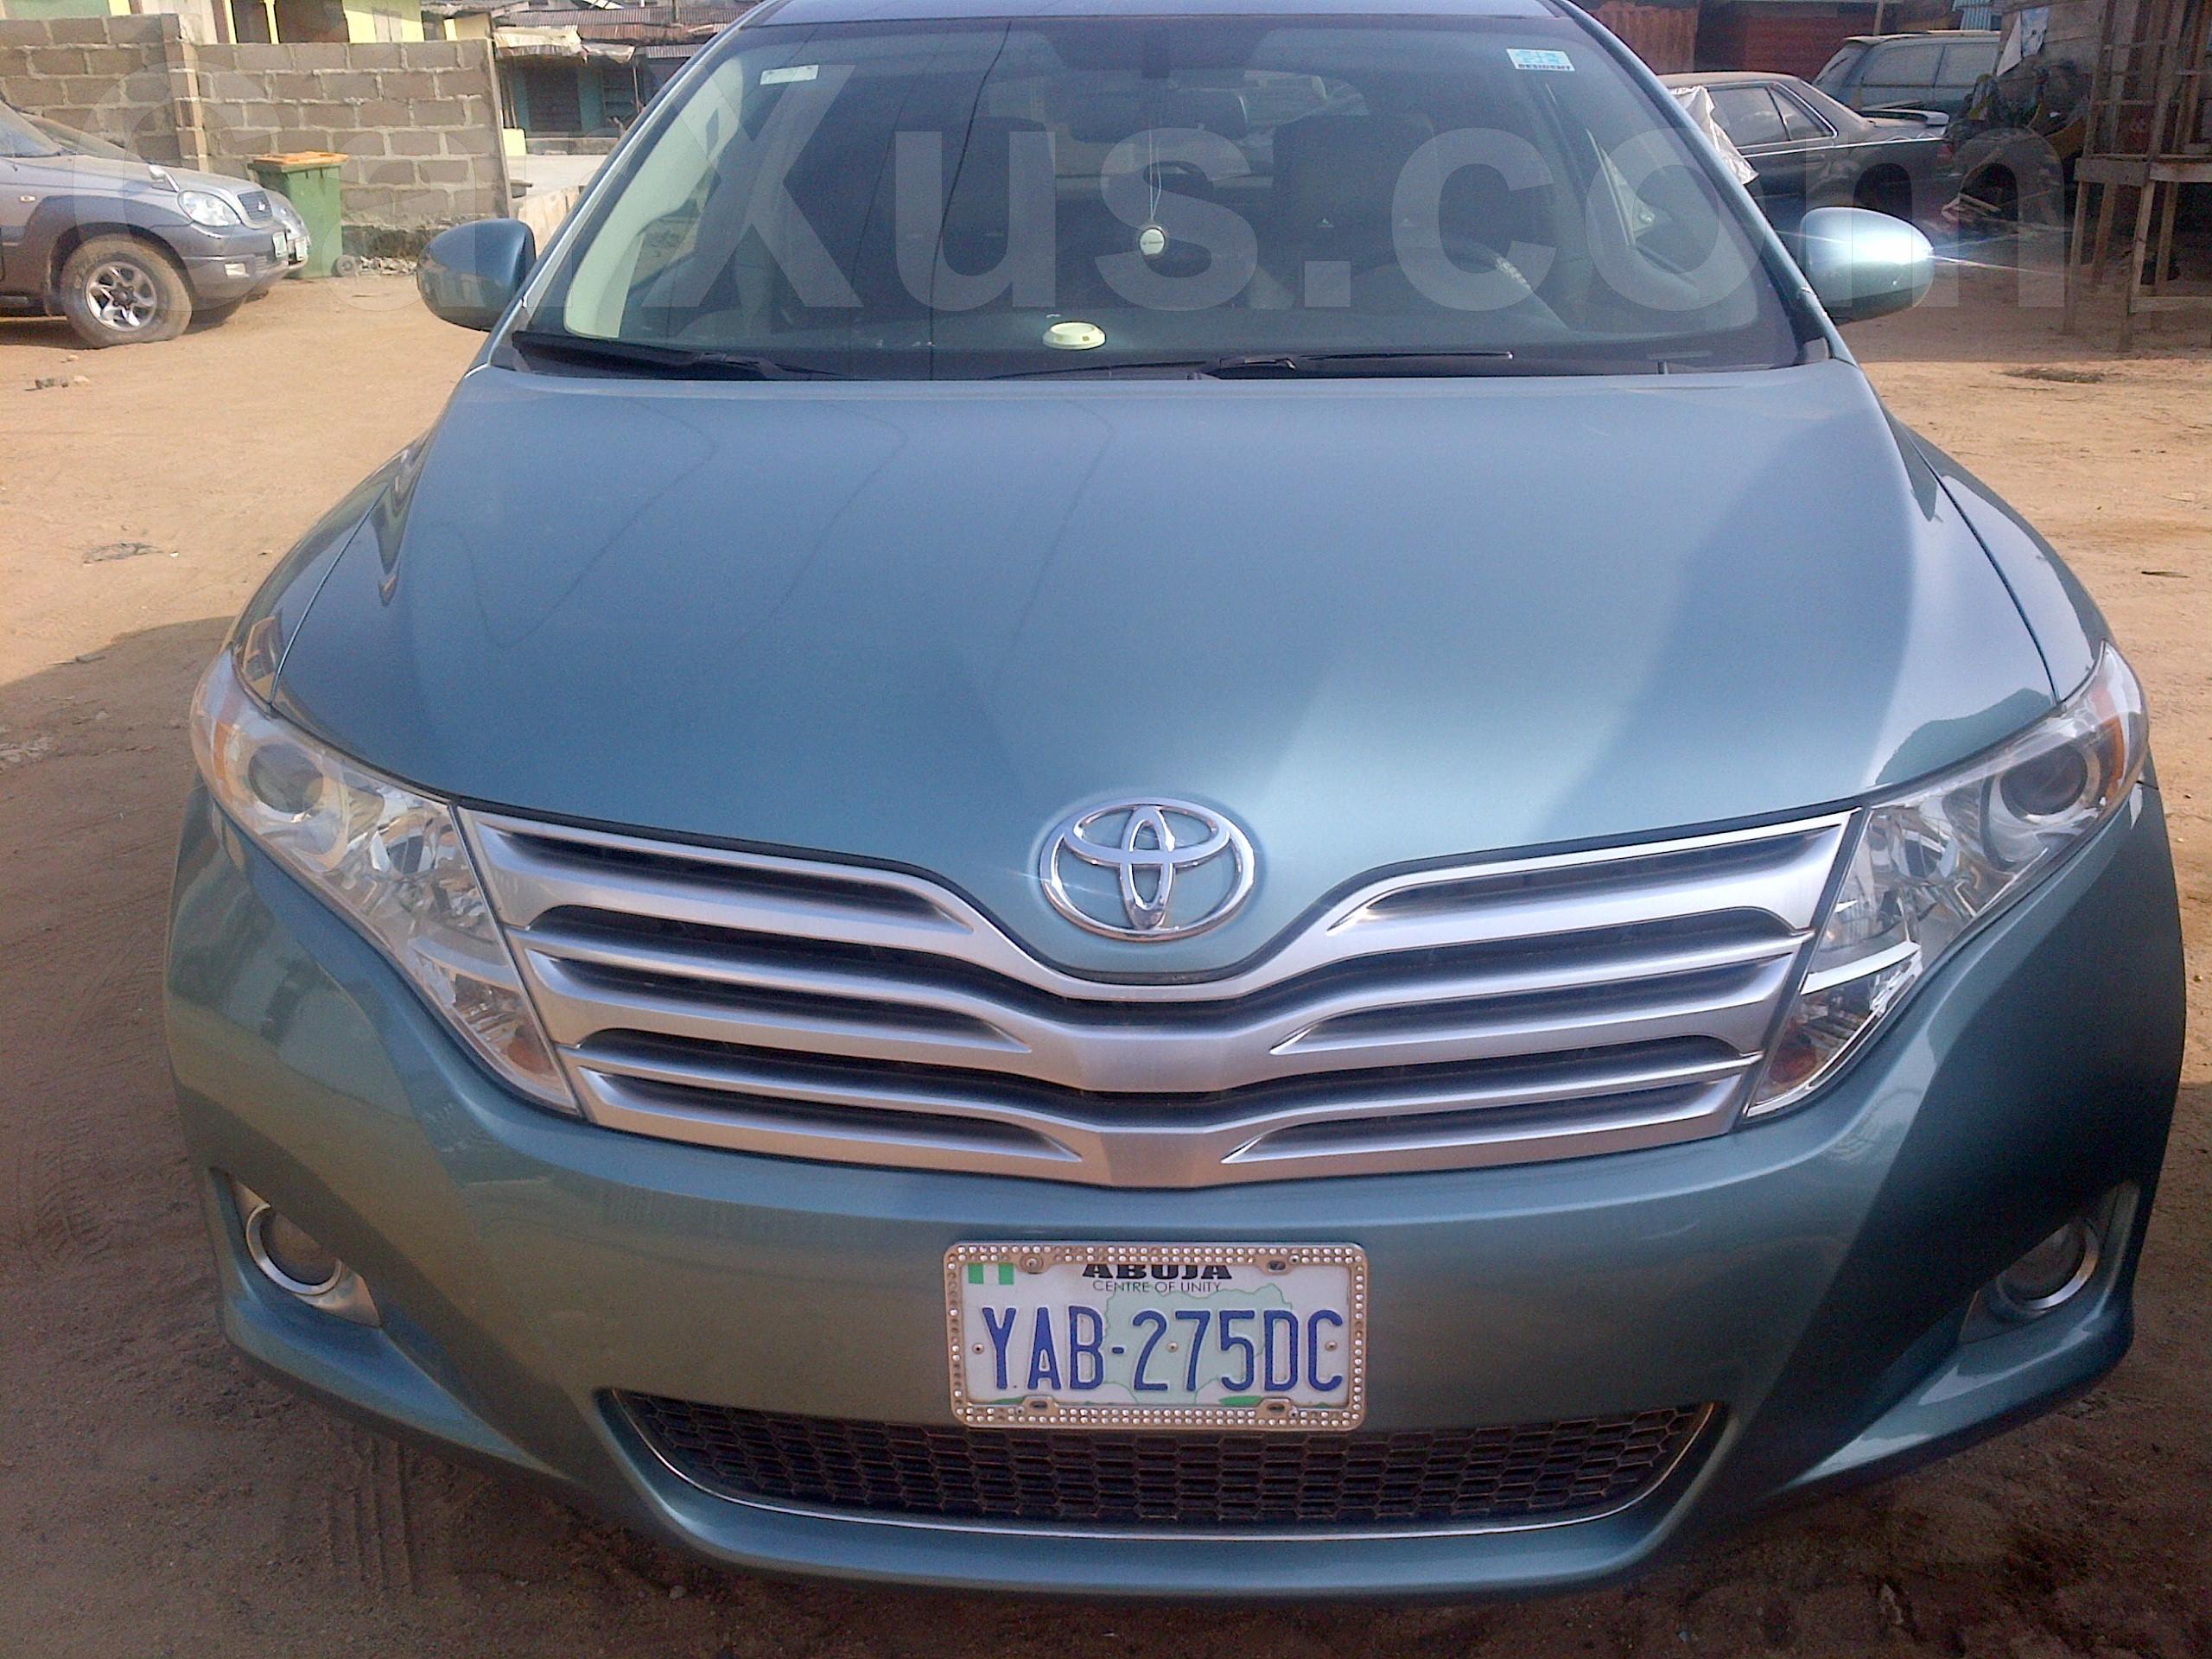 2011 Toyota Venza Buy Used Auto Car Online In Lagos Nigeria